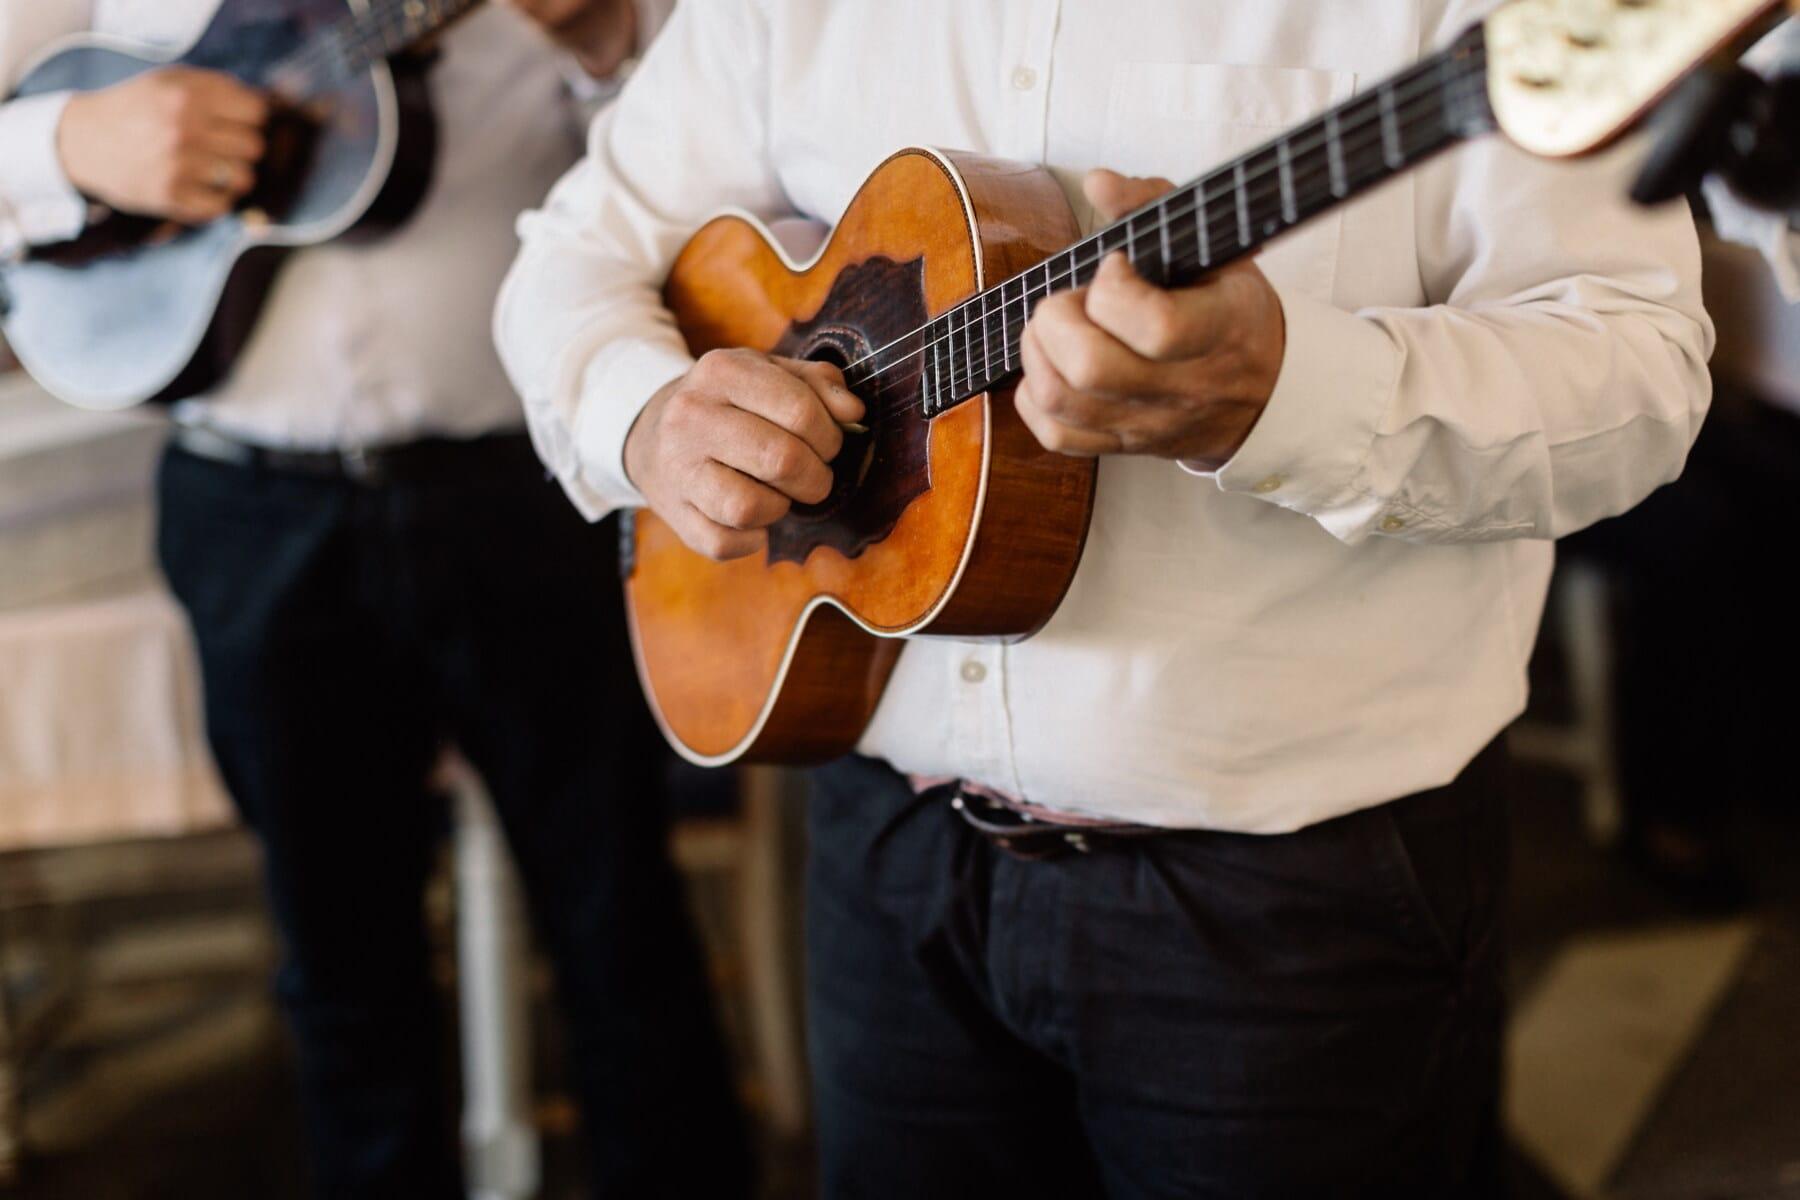 guitarist, orchestra, guitar, musician, folk, music, musical, rock, acoustic, instrument